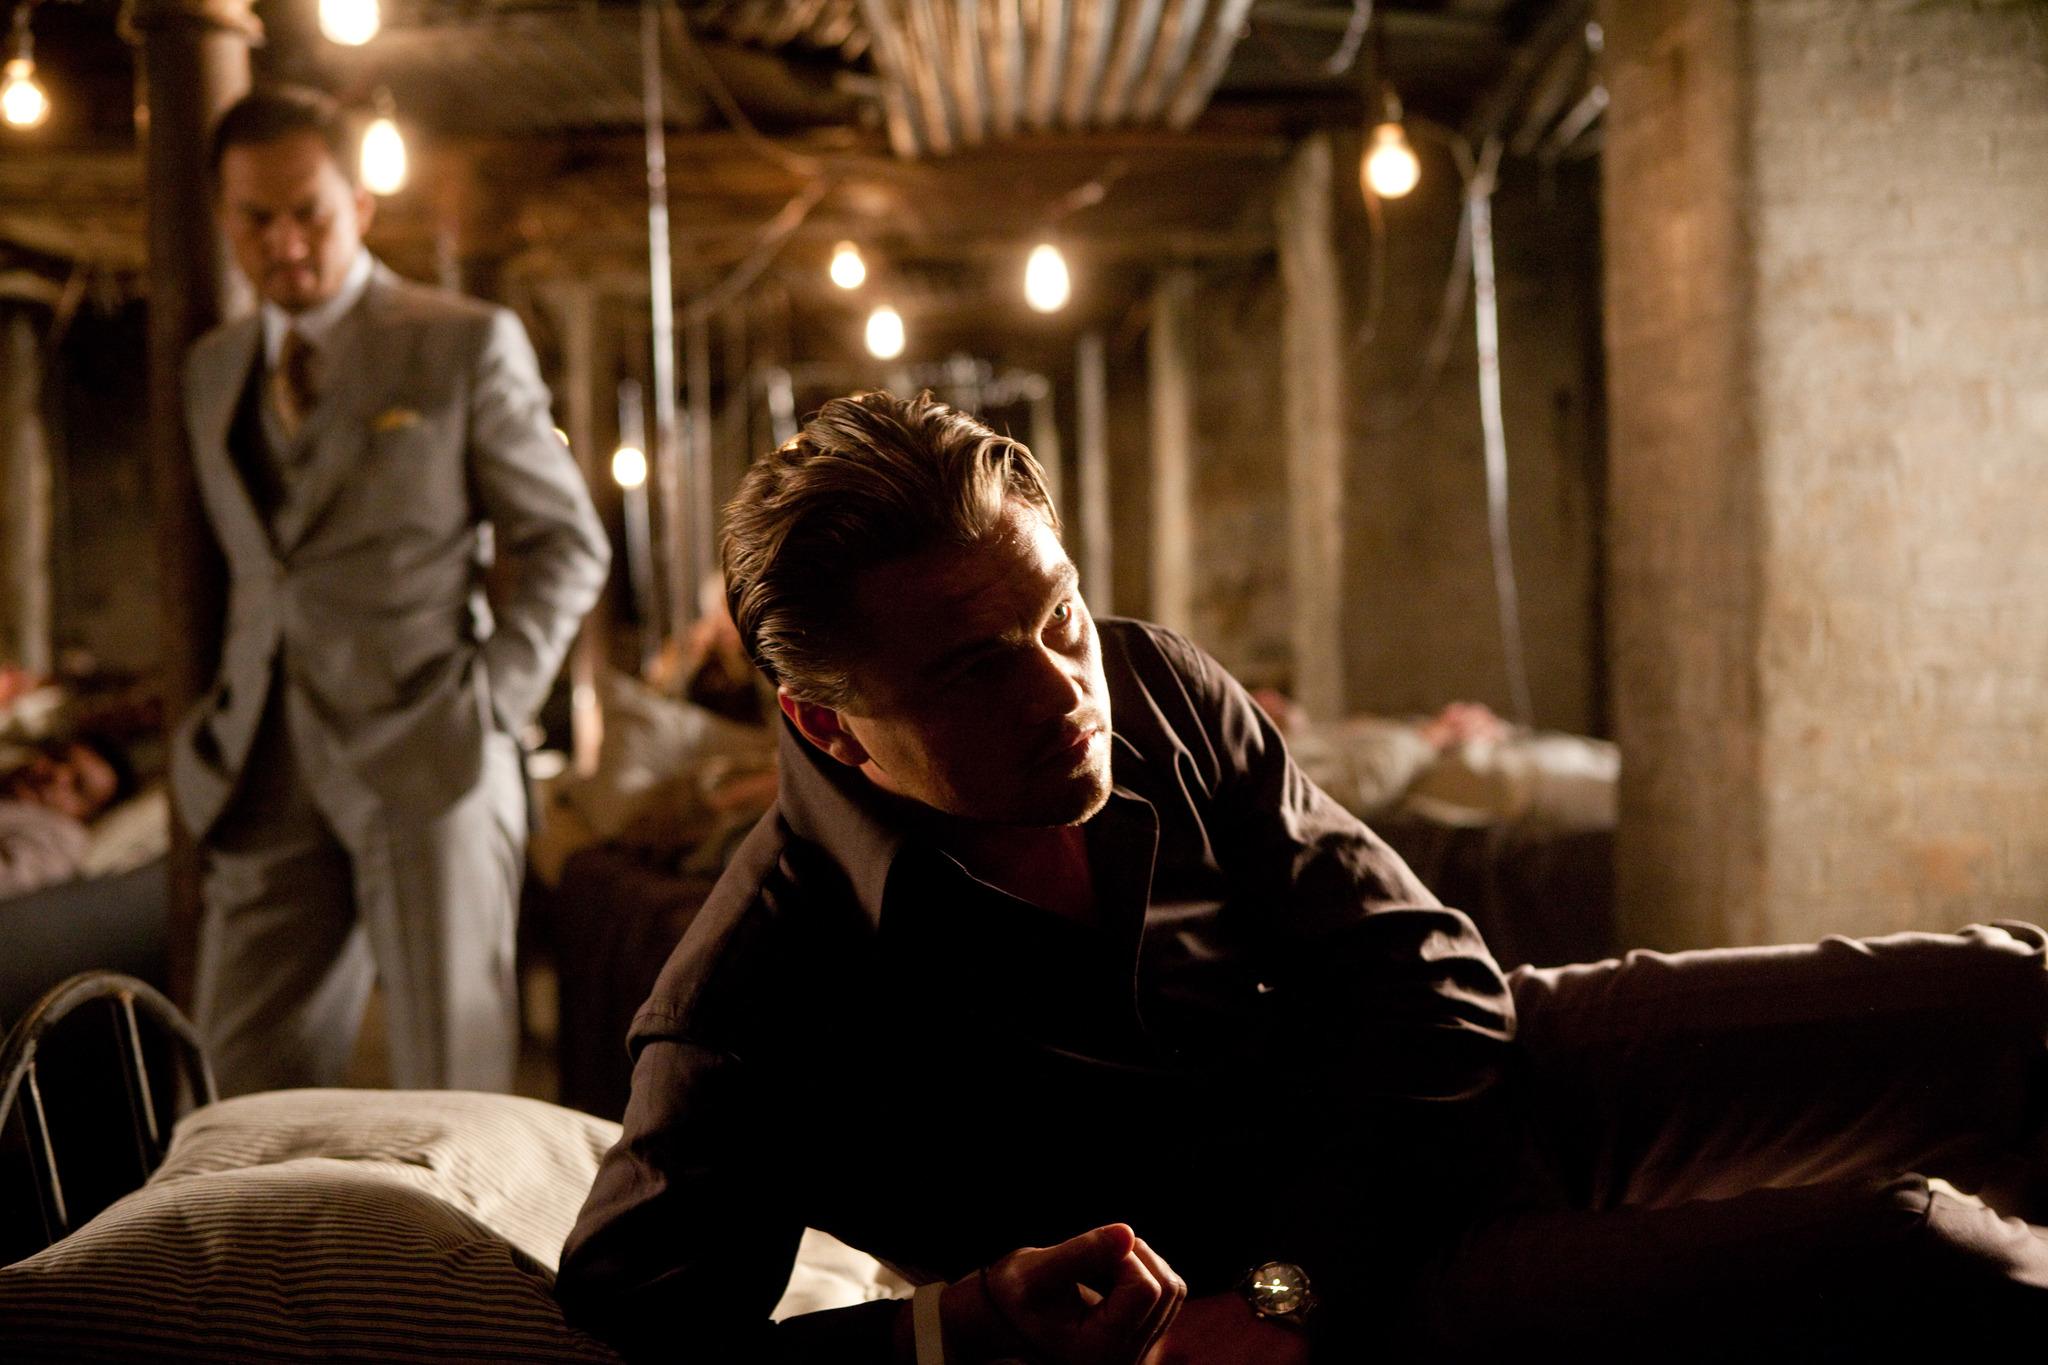 Leonardo DiCaprio and Ken Watanabe in Inception (2010)